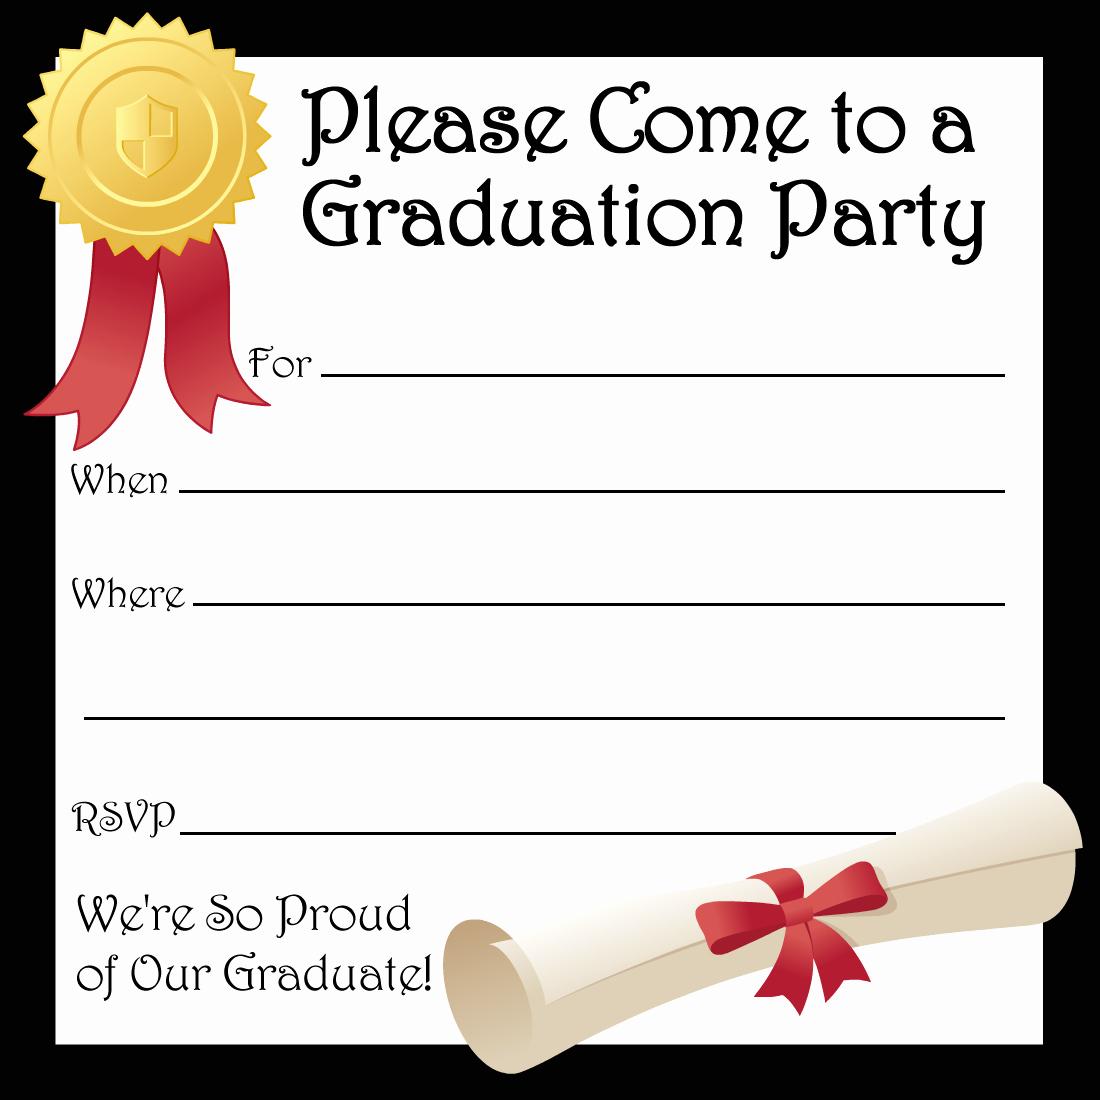 Graduation Celebration Invitation Templates Lovely 15 Graduation Party Invitations – Party Ideas